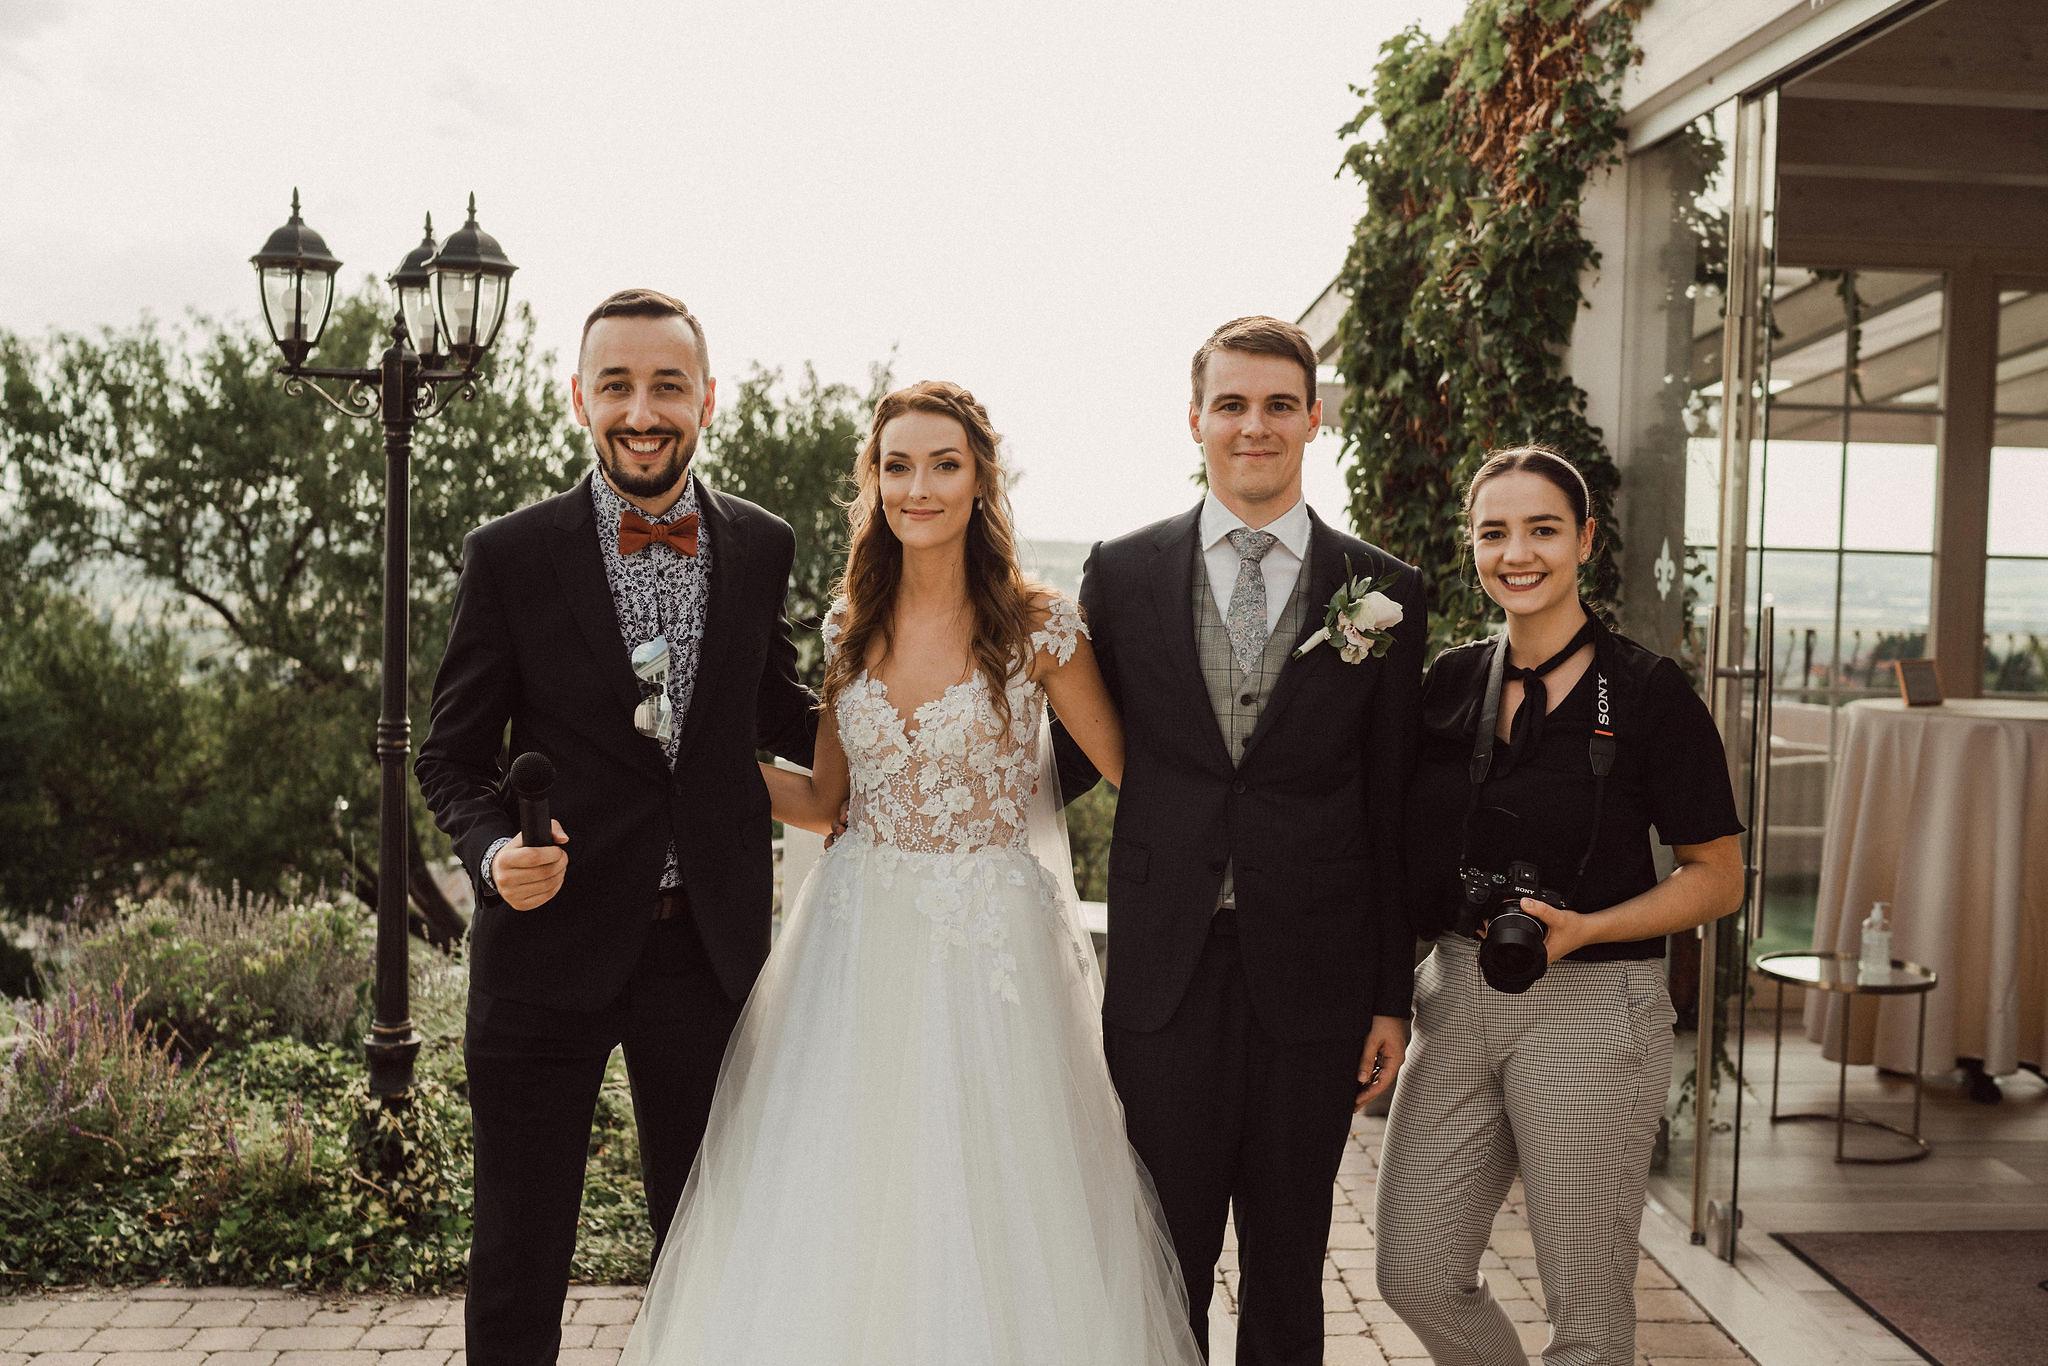 svadba-od-zazitkarov-cenajpg